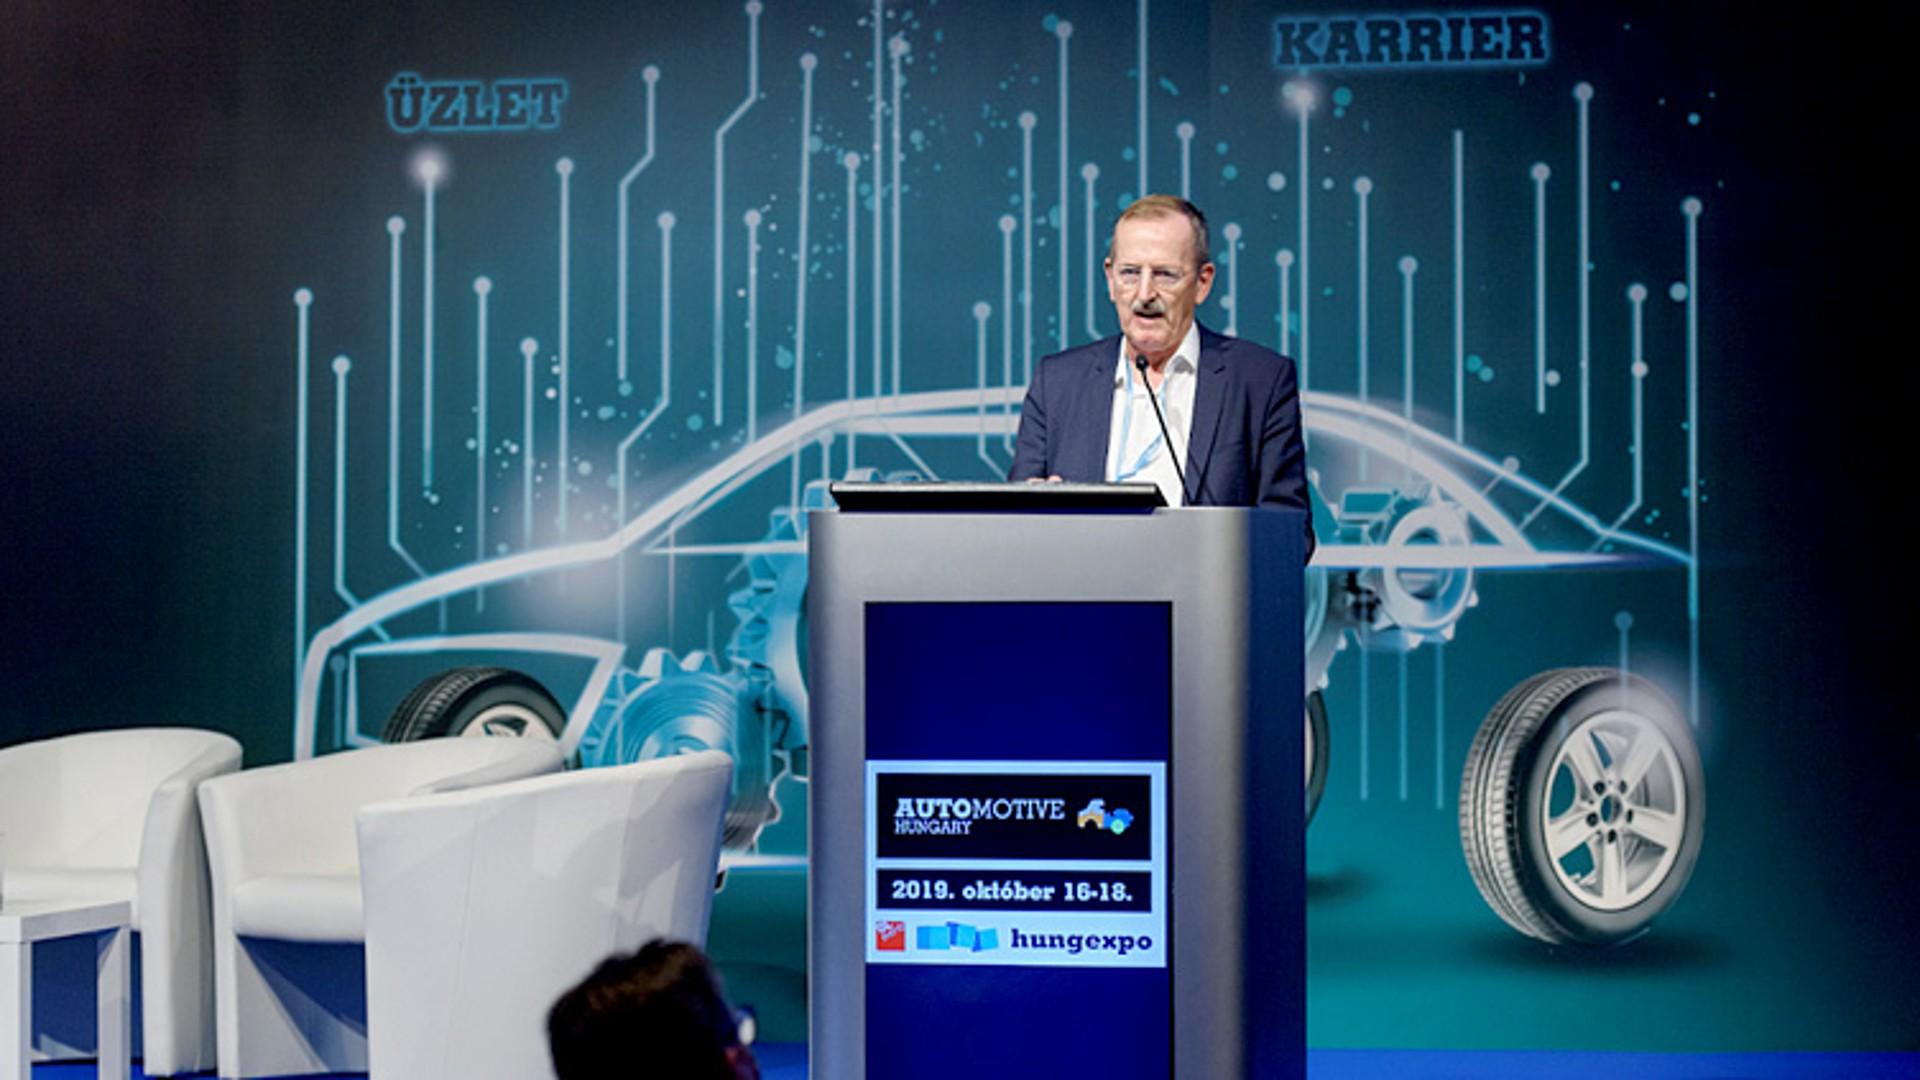 Speaker Günther Schulze at Automotive Hungary Expo conference